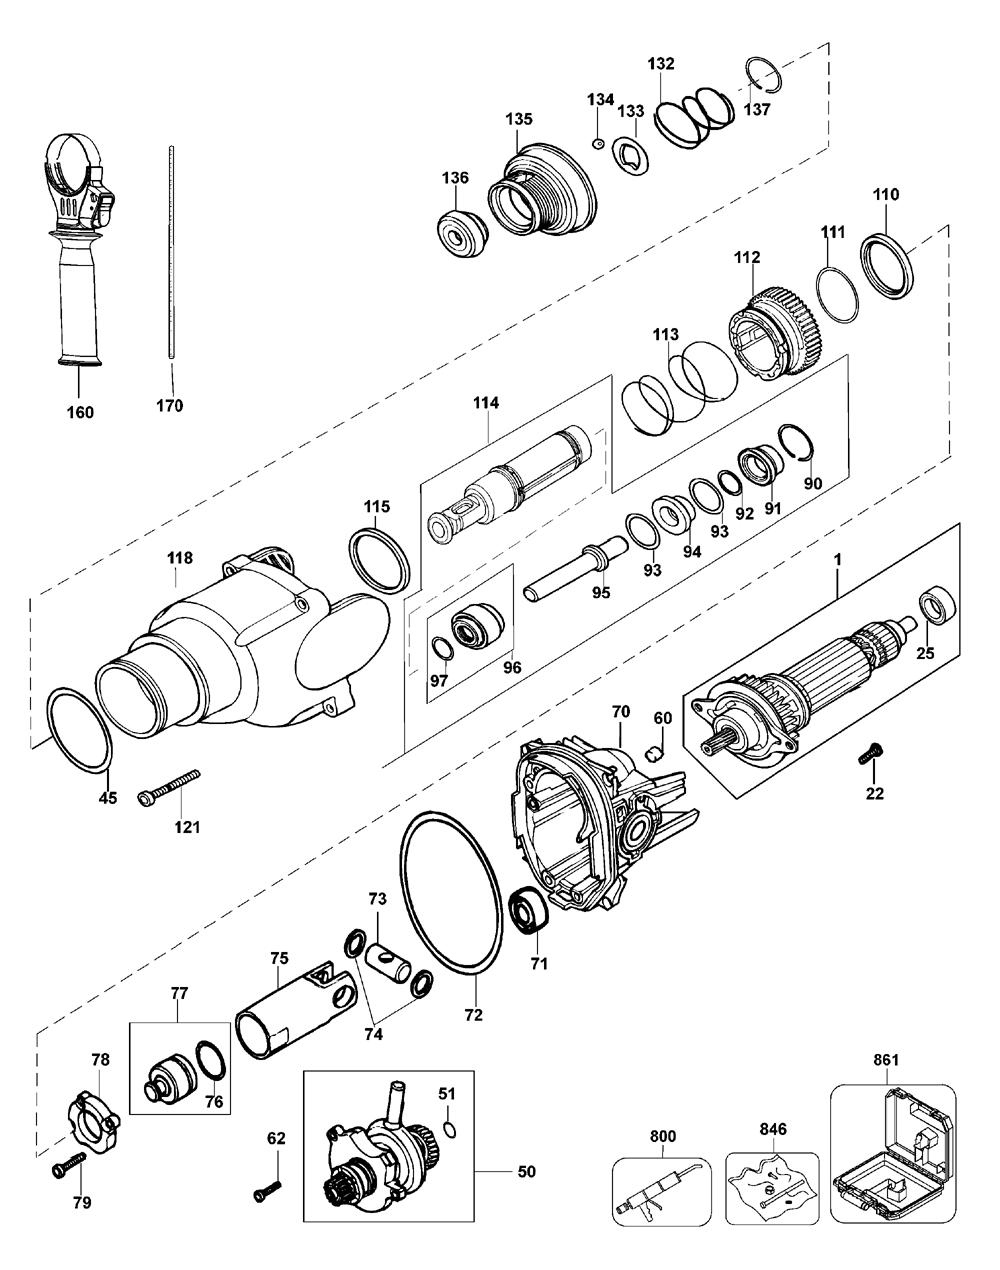 D25203K-Dewalt-T2-PB-1Break Down